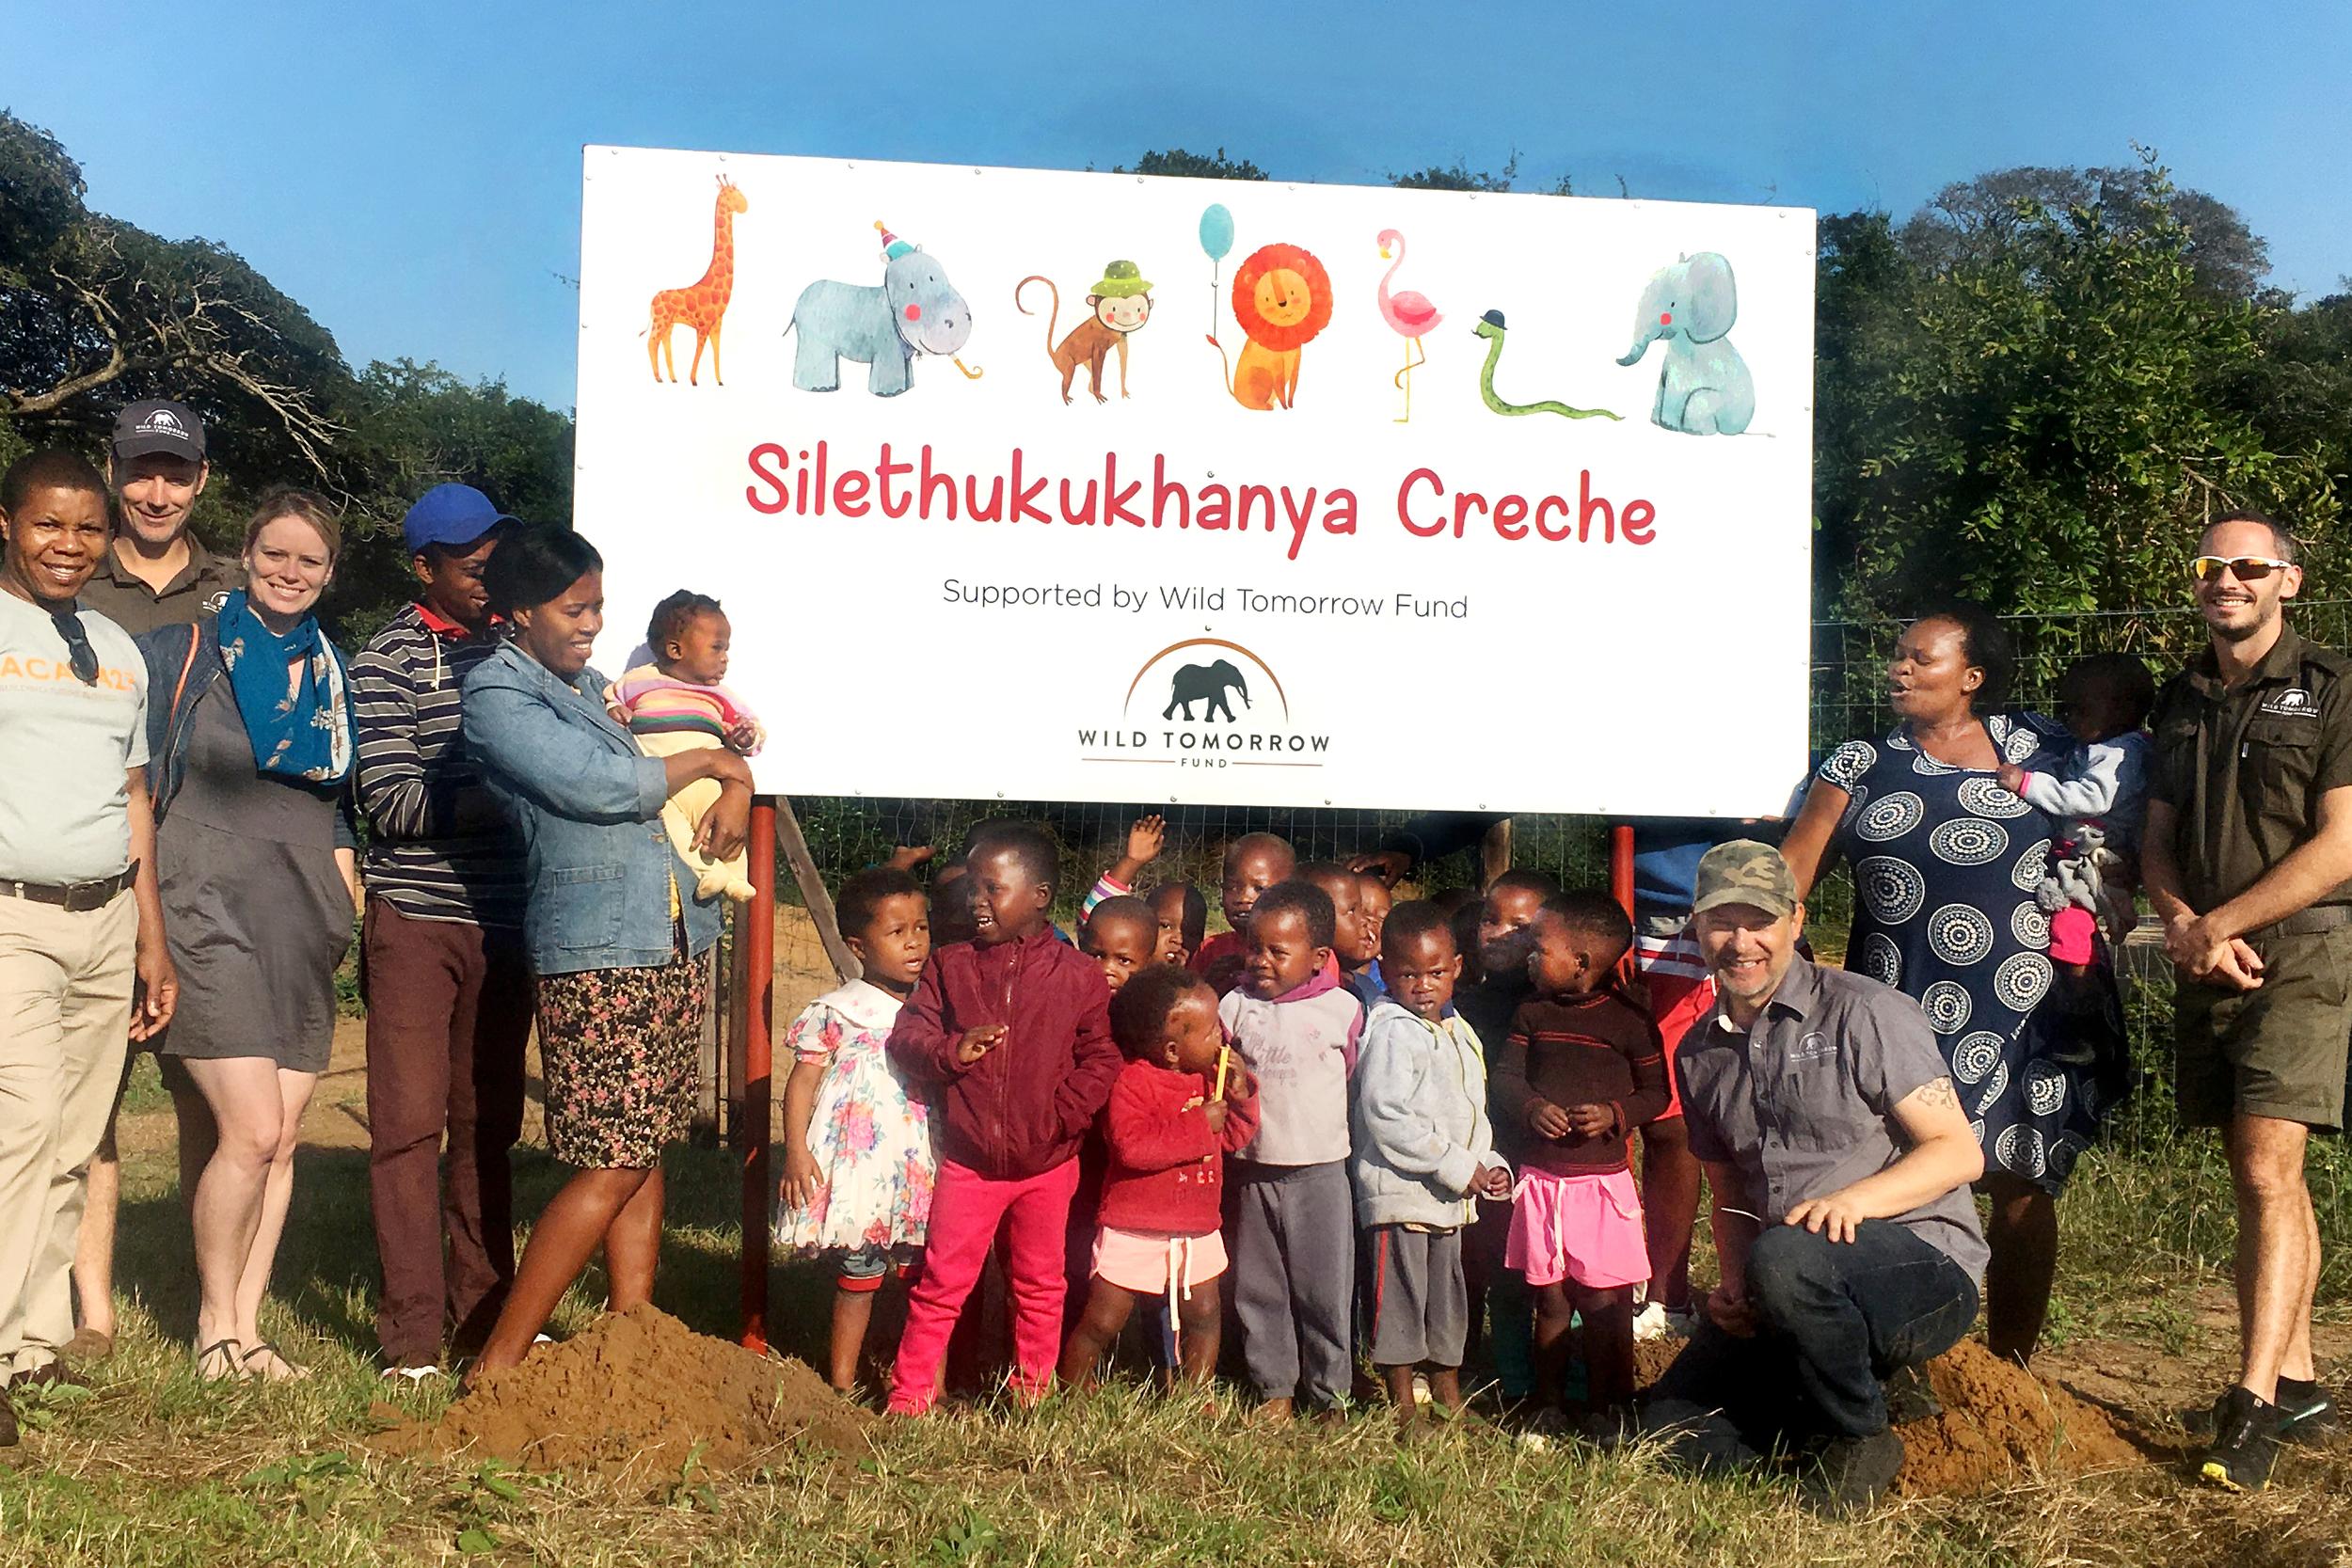 Sharing a special moment at the Silethukukhanya Creche